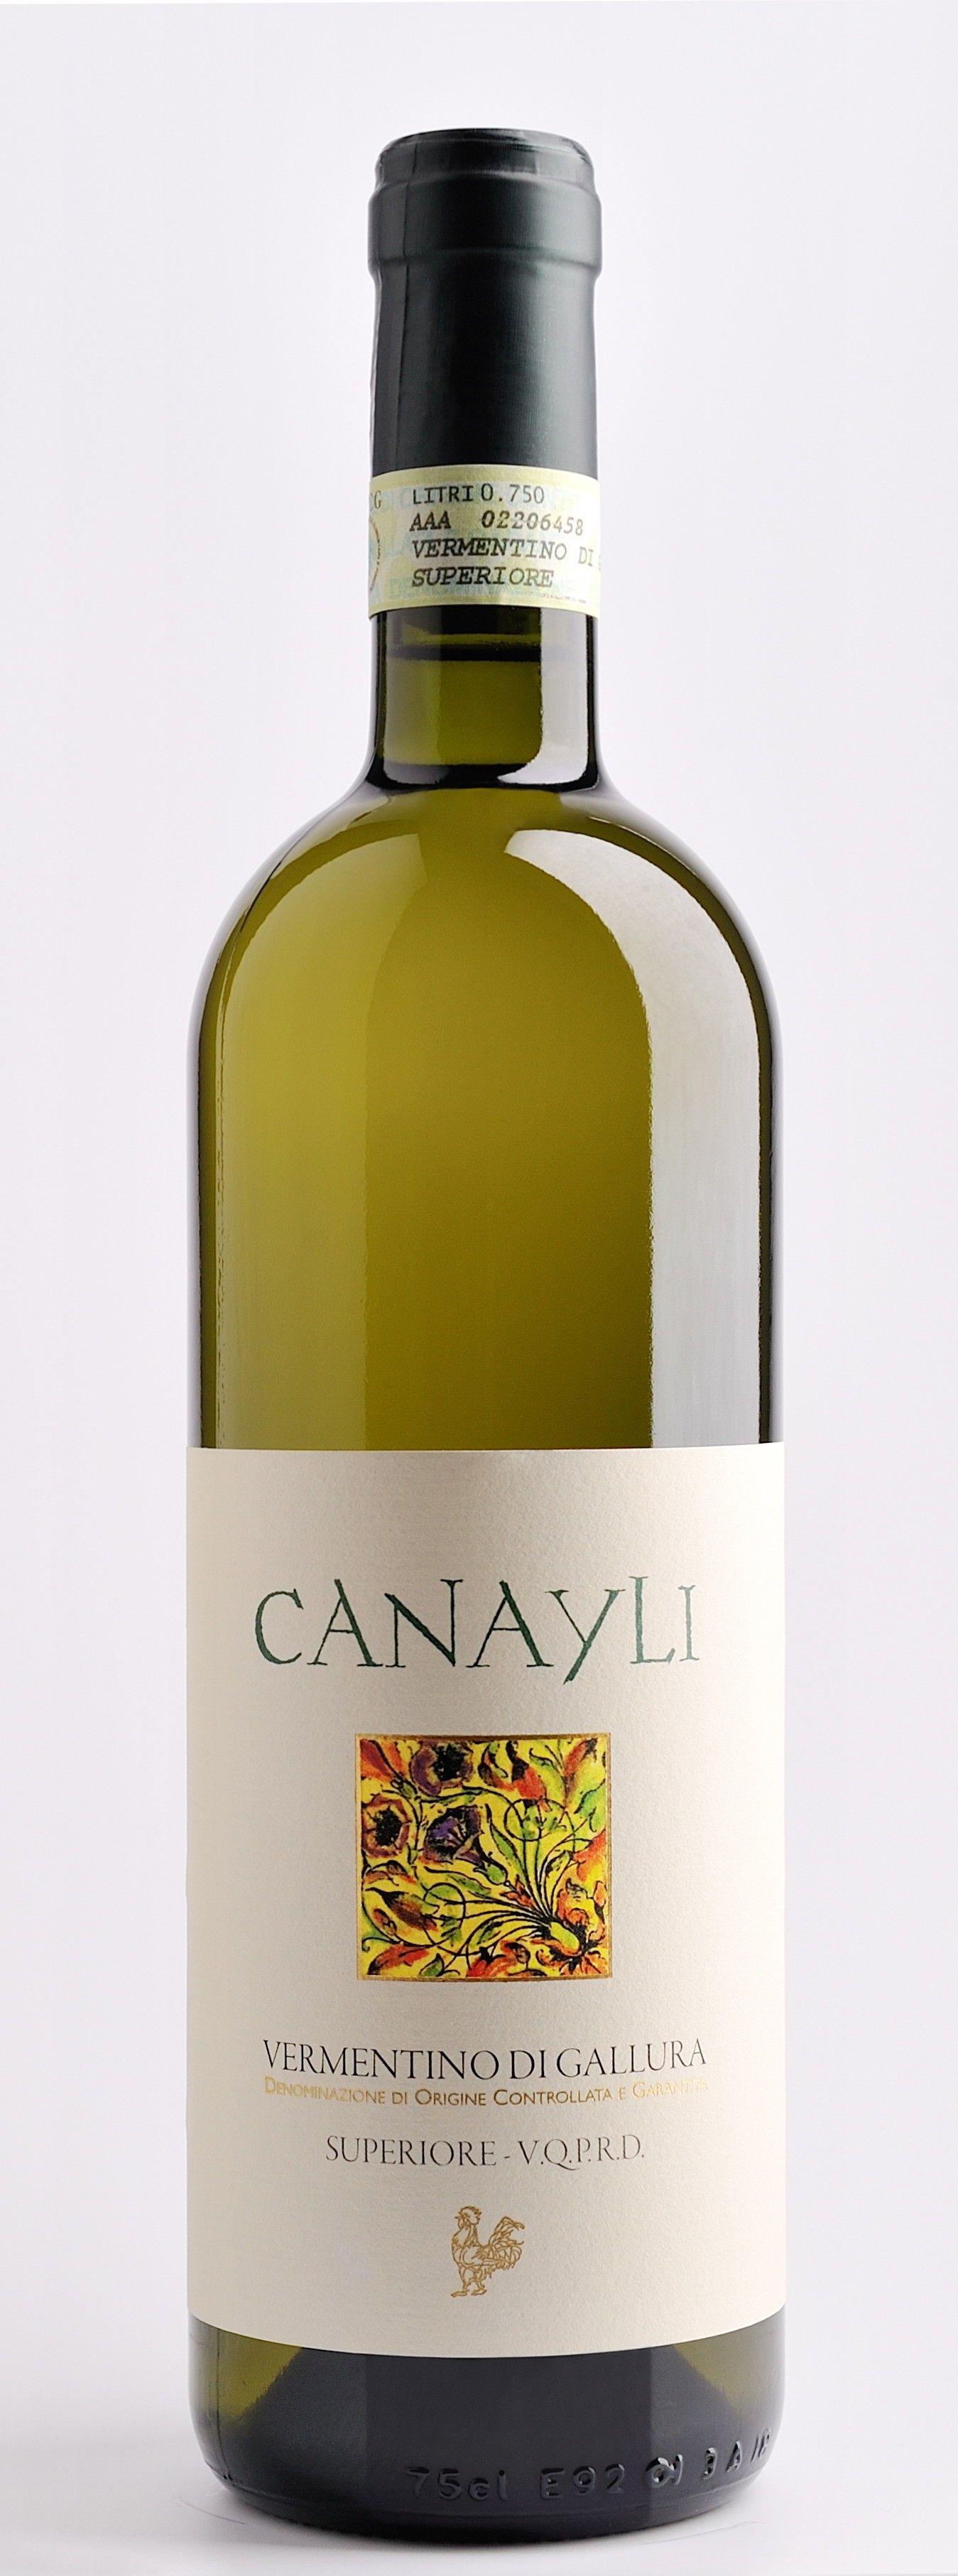 http://www.wineandgallery.cz/28-thickbox_default/canayli.jpg